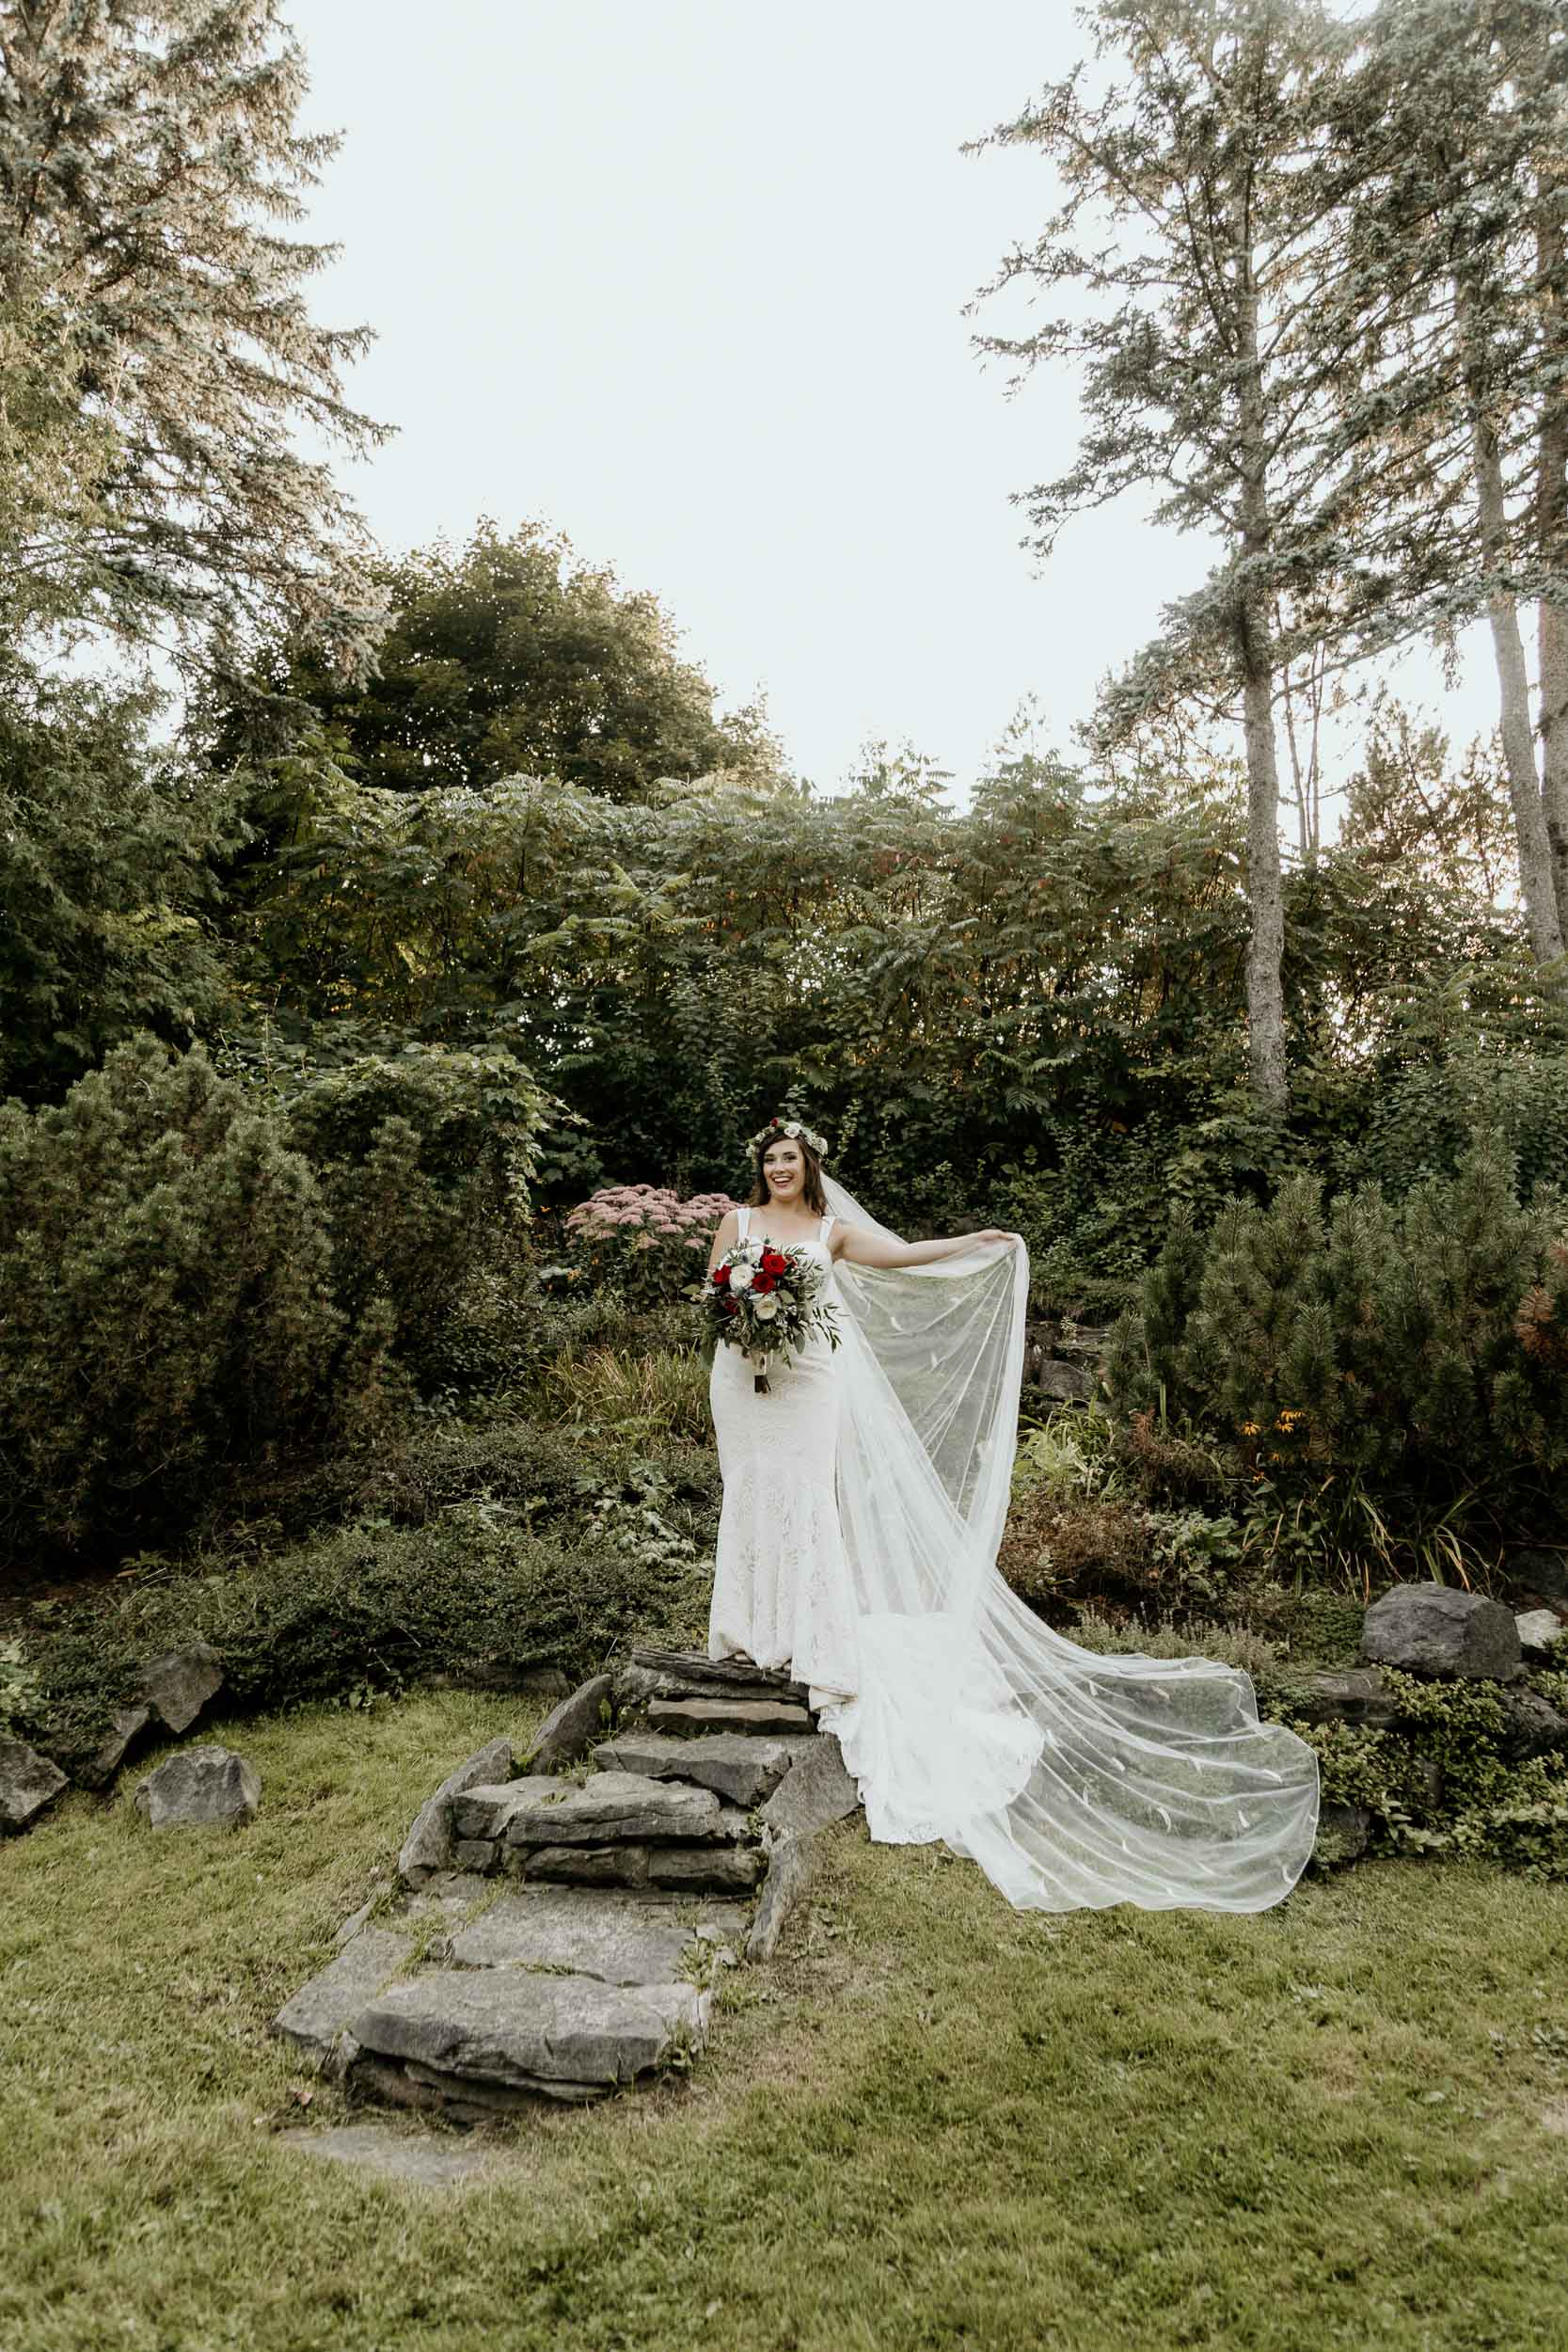 intimate-wedding-elopement-photographer-ottawa-toronto-7601.jpg